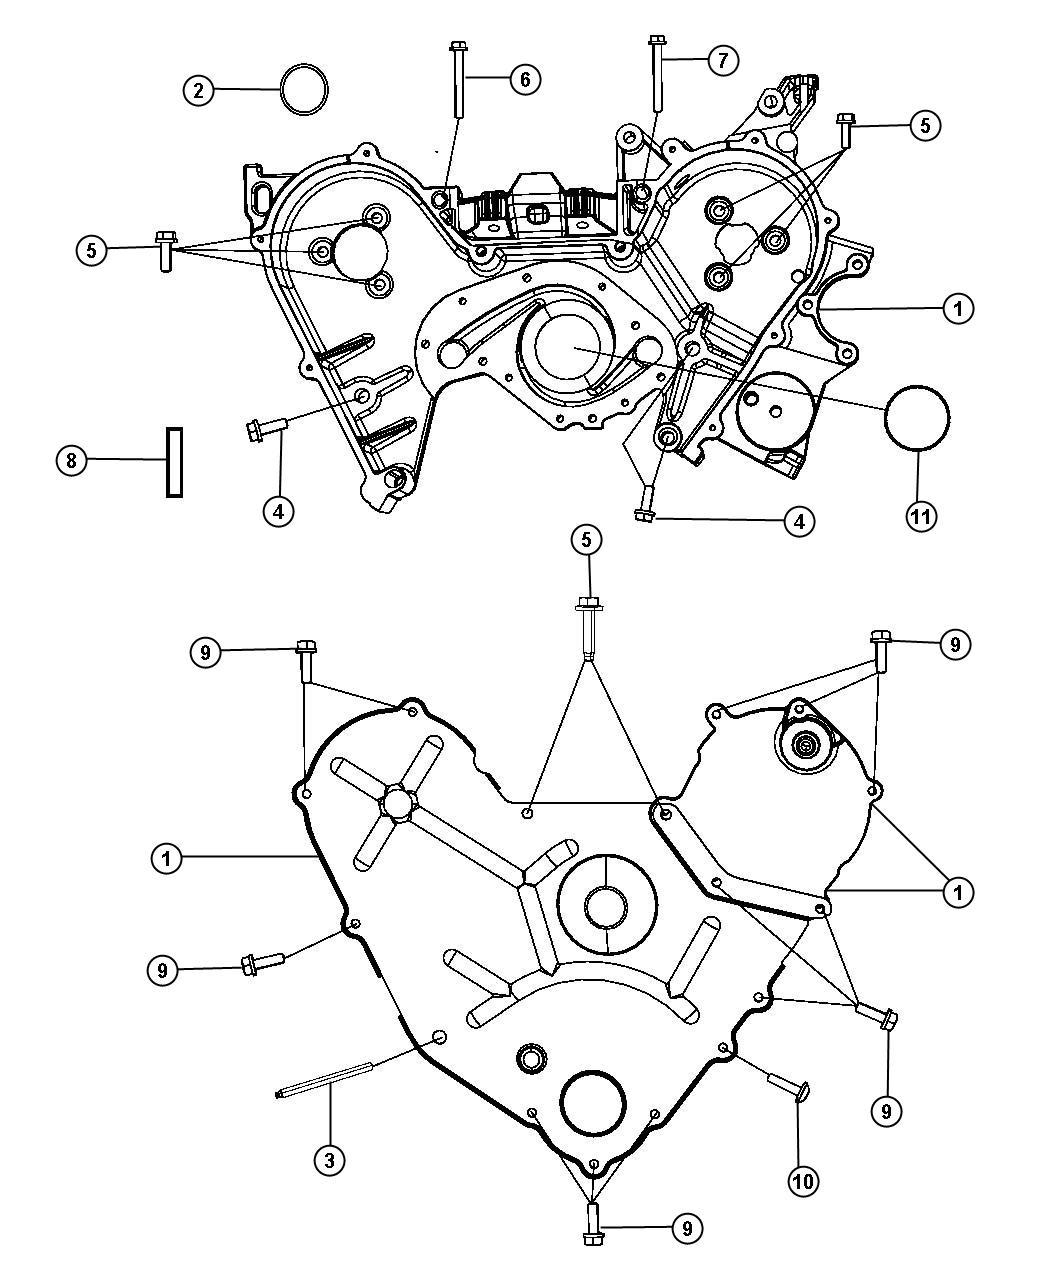 Dodge 3 5l High Output V6 24v Mpi 6 Speed Automatic 62te Timing Case Cover 3 5l Egf